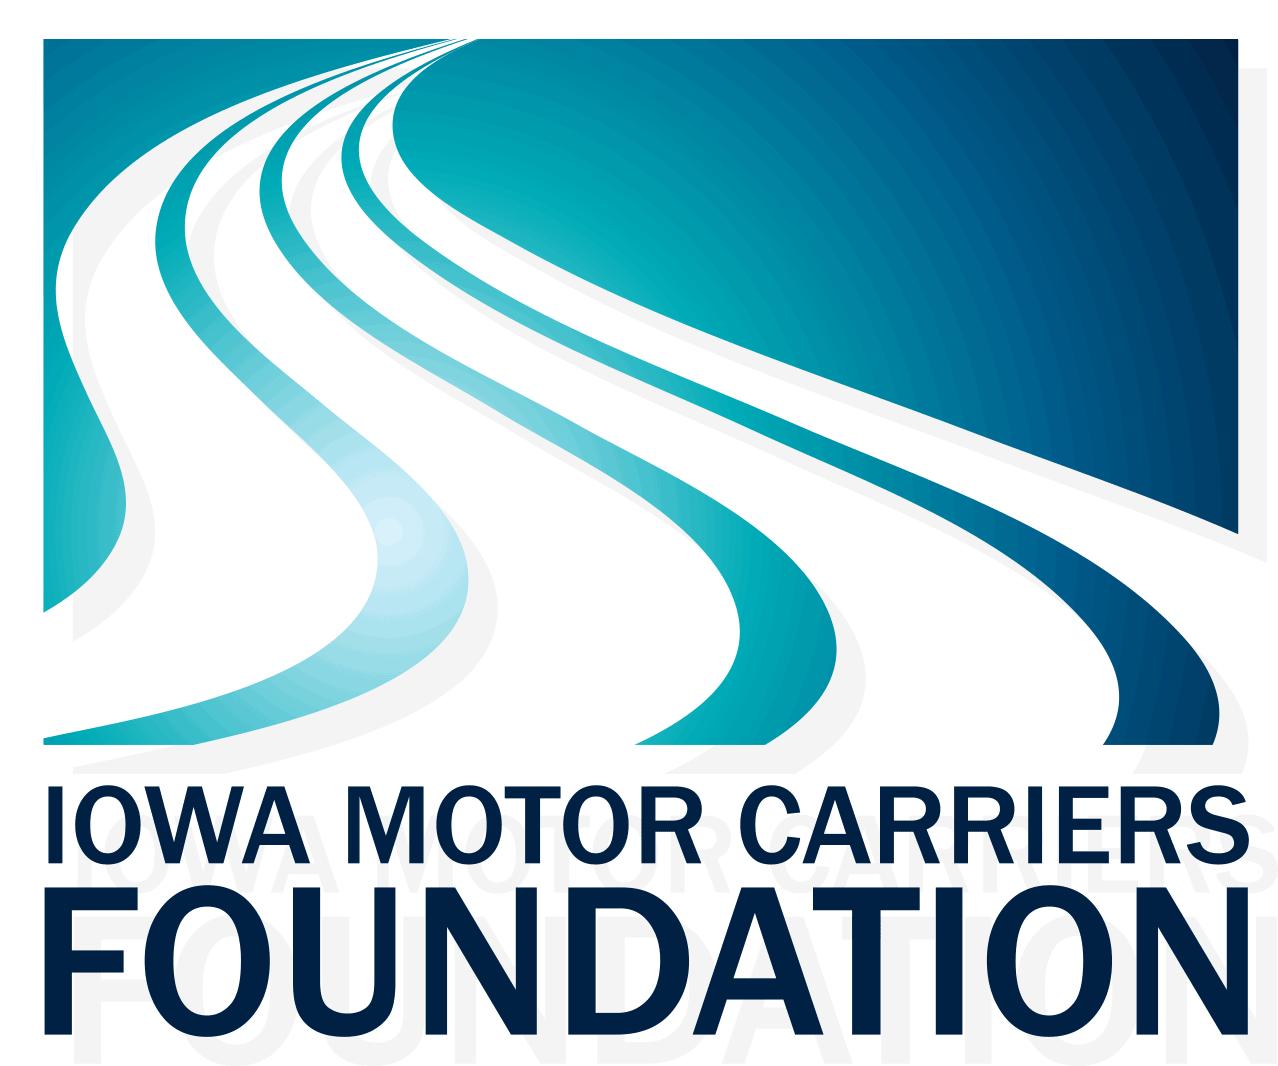 Iowa Motor Carriers Foundation